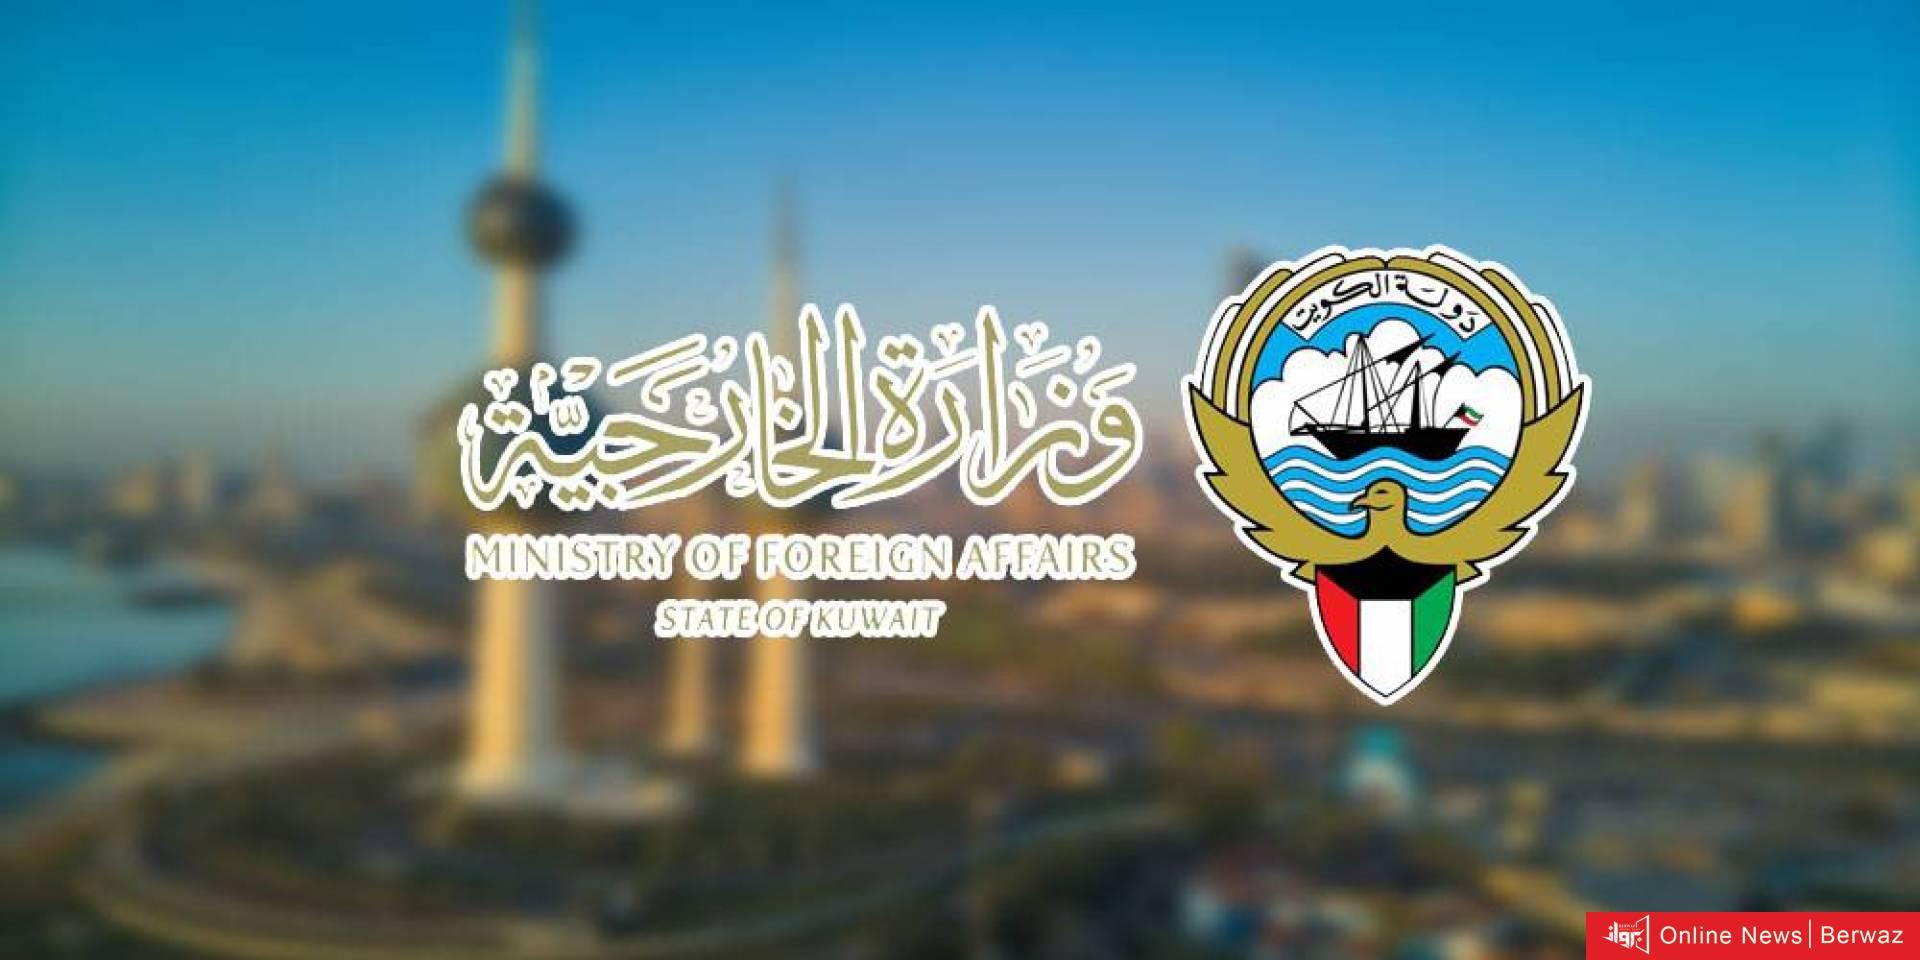 00 934828 highres - ترحيب كويتي بإعلان توقيع اتفاق وقف إطلاق النار بين الأطراف الليبية